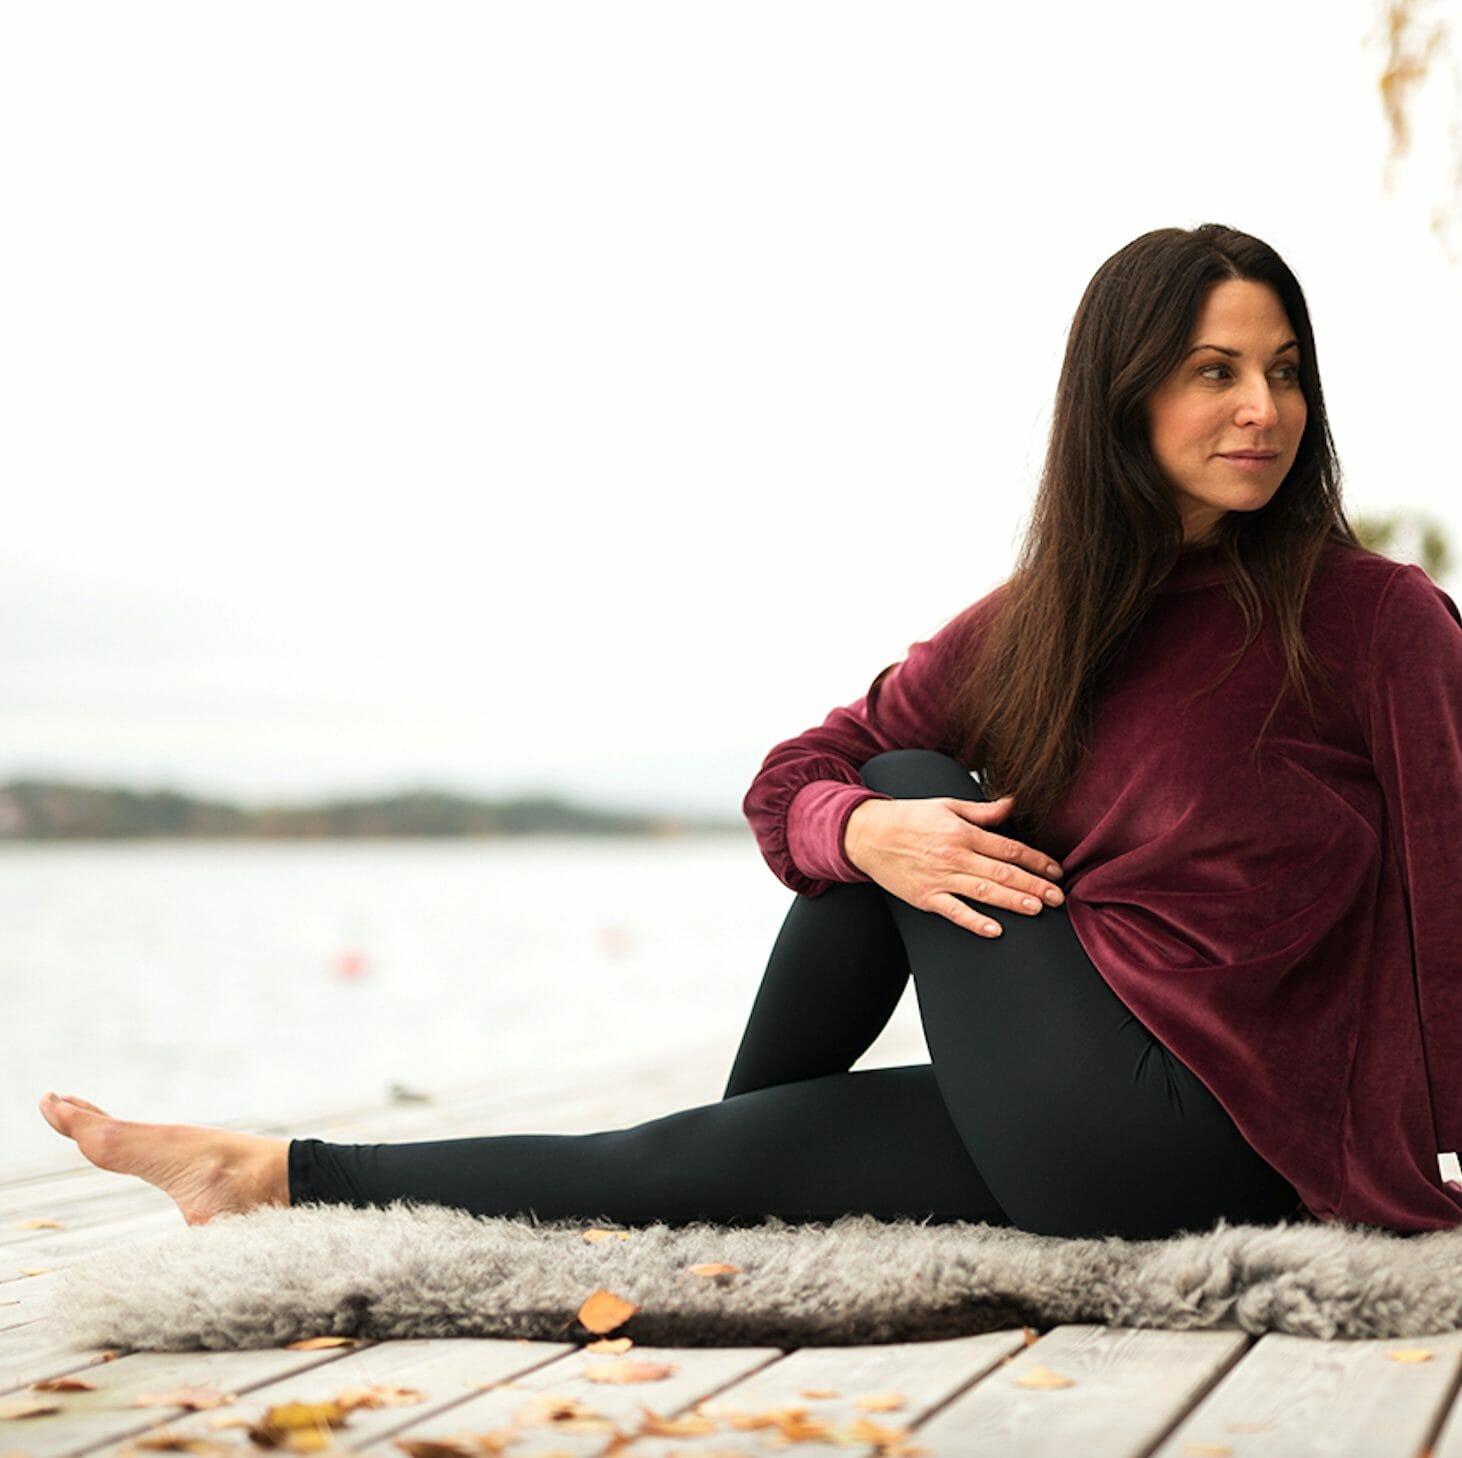 Frostig prognos Lekplatsutrustning  Skön pre yoga tröja i mjuk velour - Cosy feminine pre-yoga sweater ...